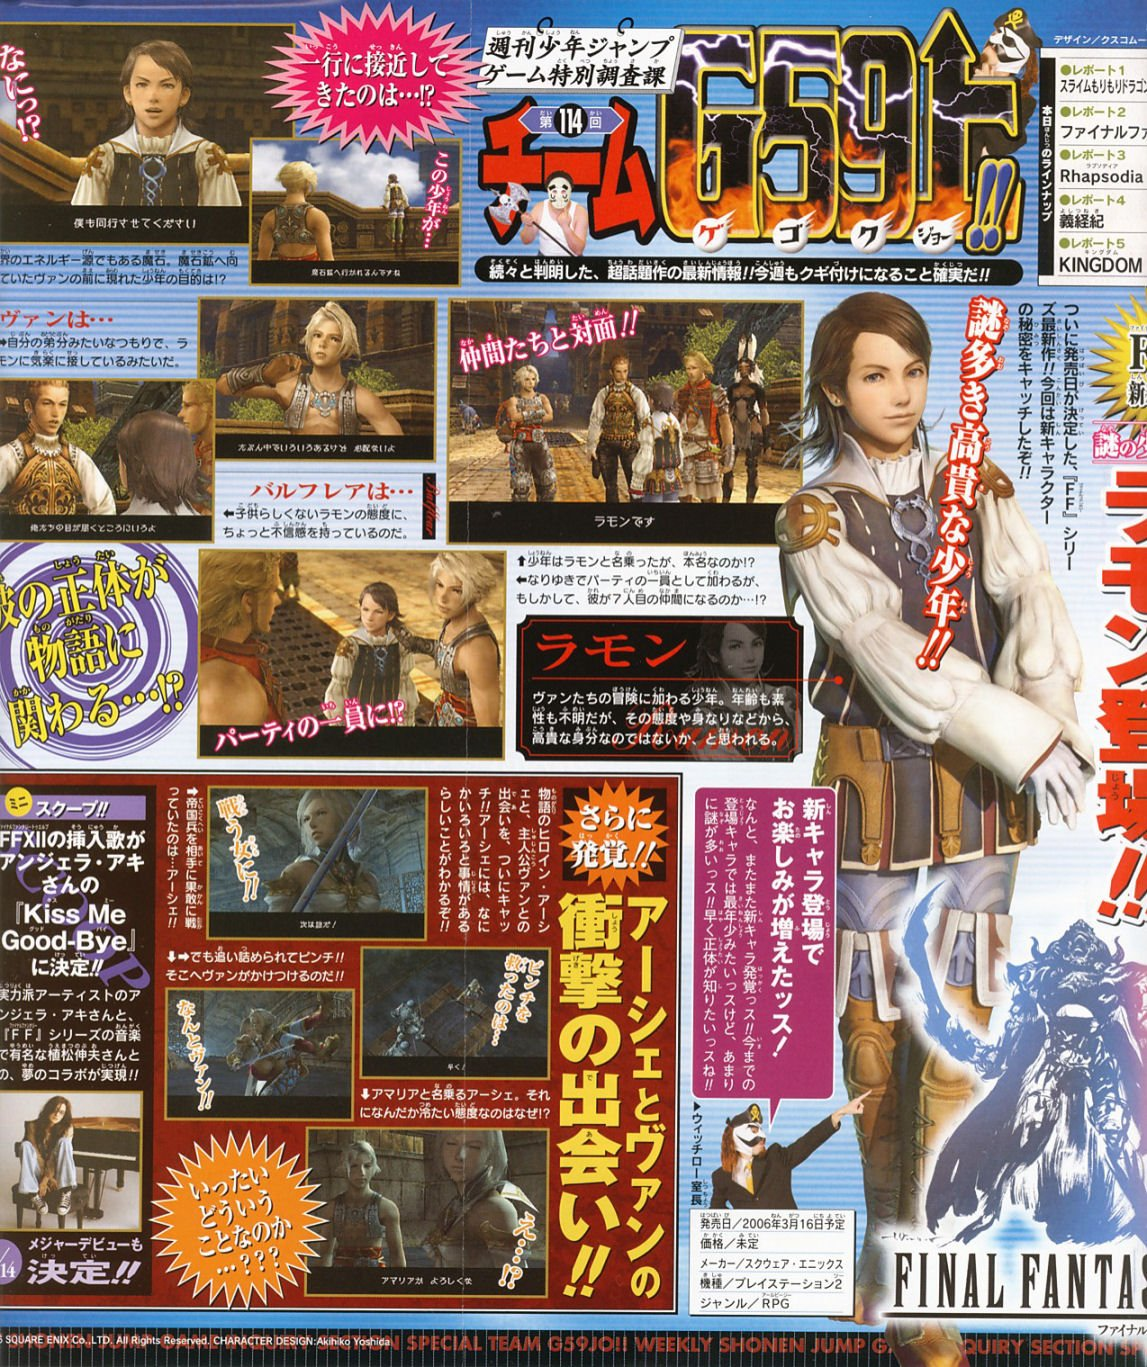 Final Fantasy XII: Un petit scan